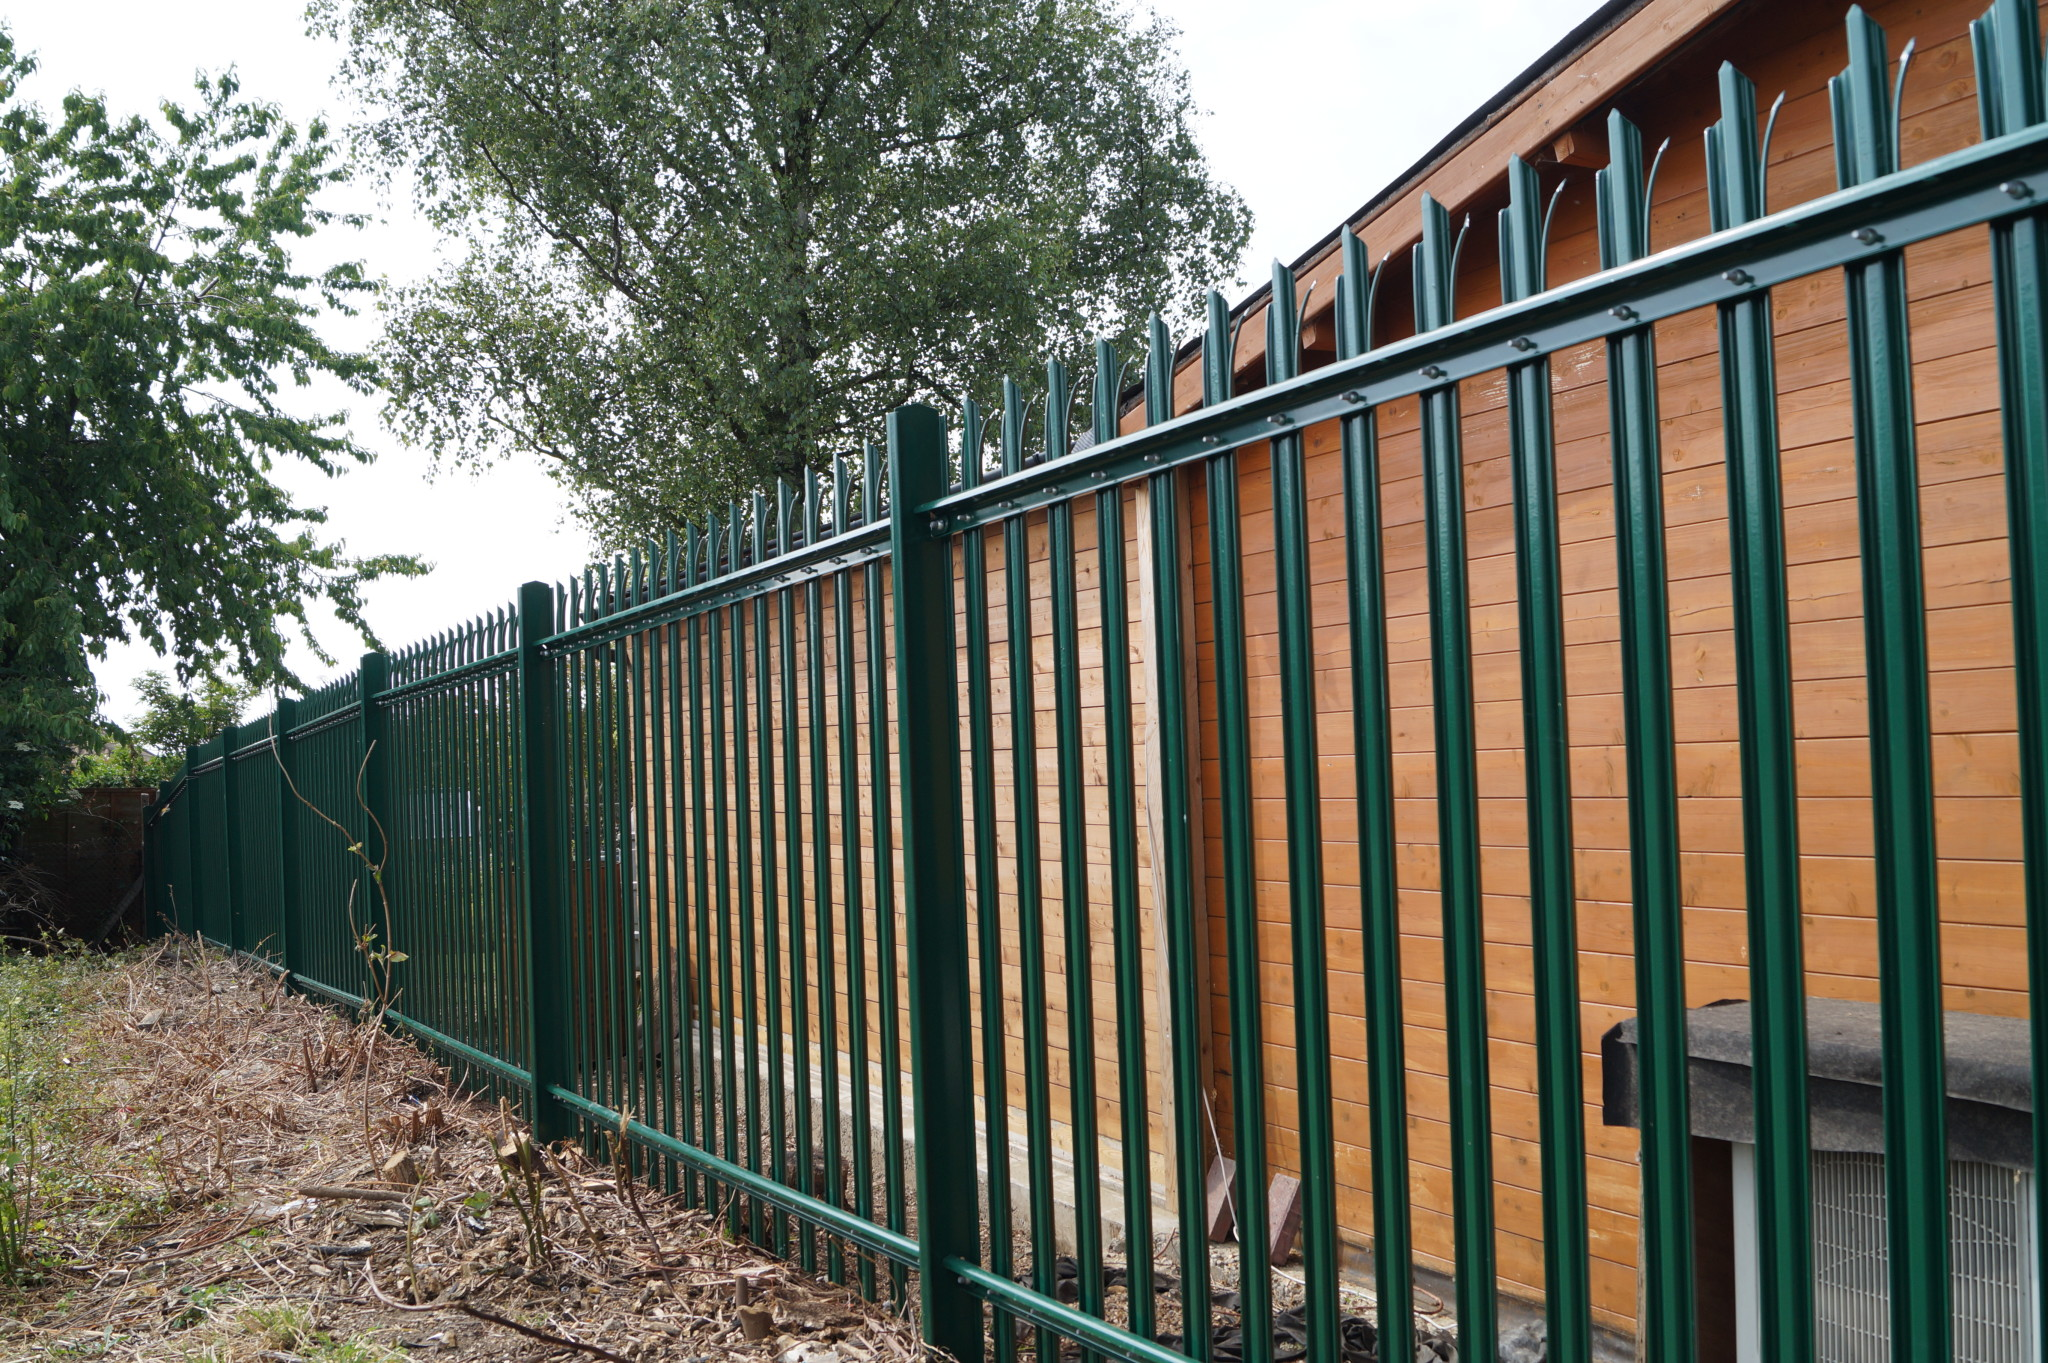 School Boundary Fencing - Waller Services in Kent